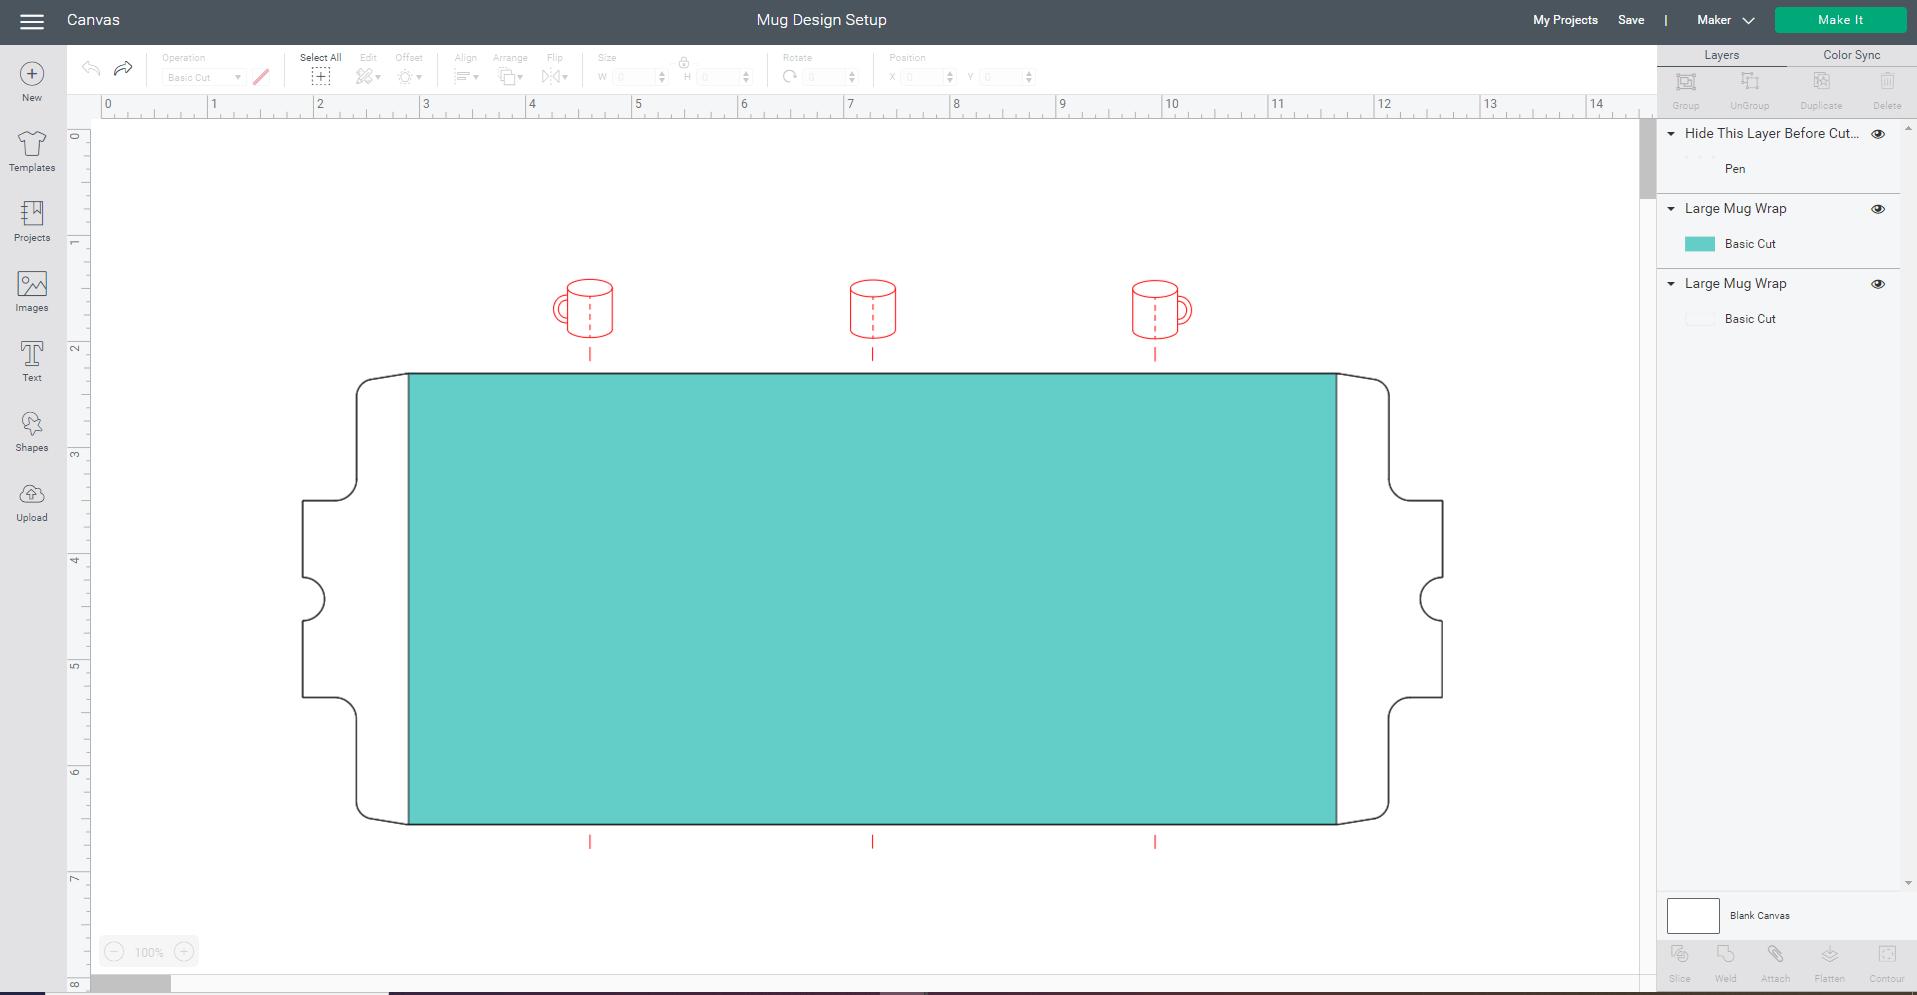 Cricut Design Space screenshot - Mug Design Setup canvas